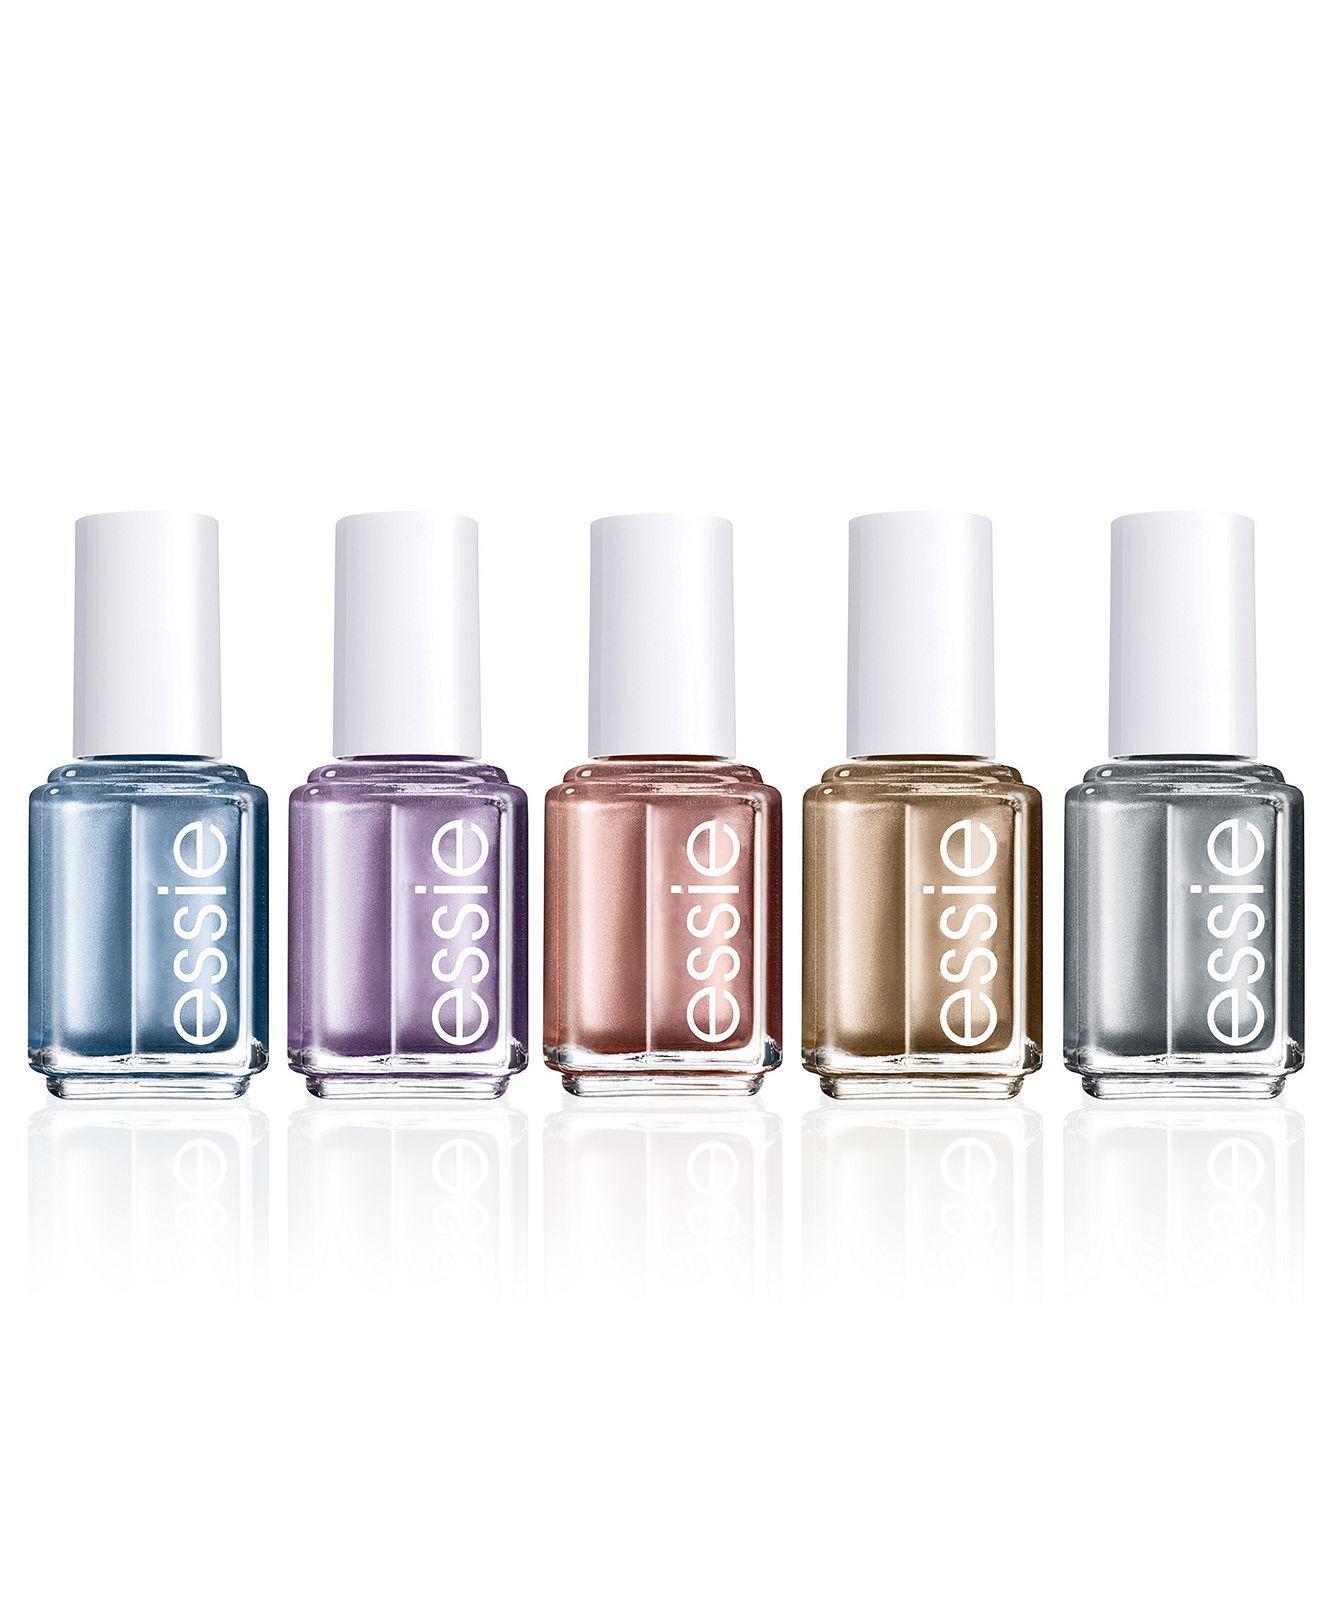 Essie mirror metallics collection | Metallic, Metallic nails and ...